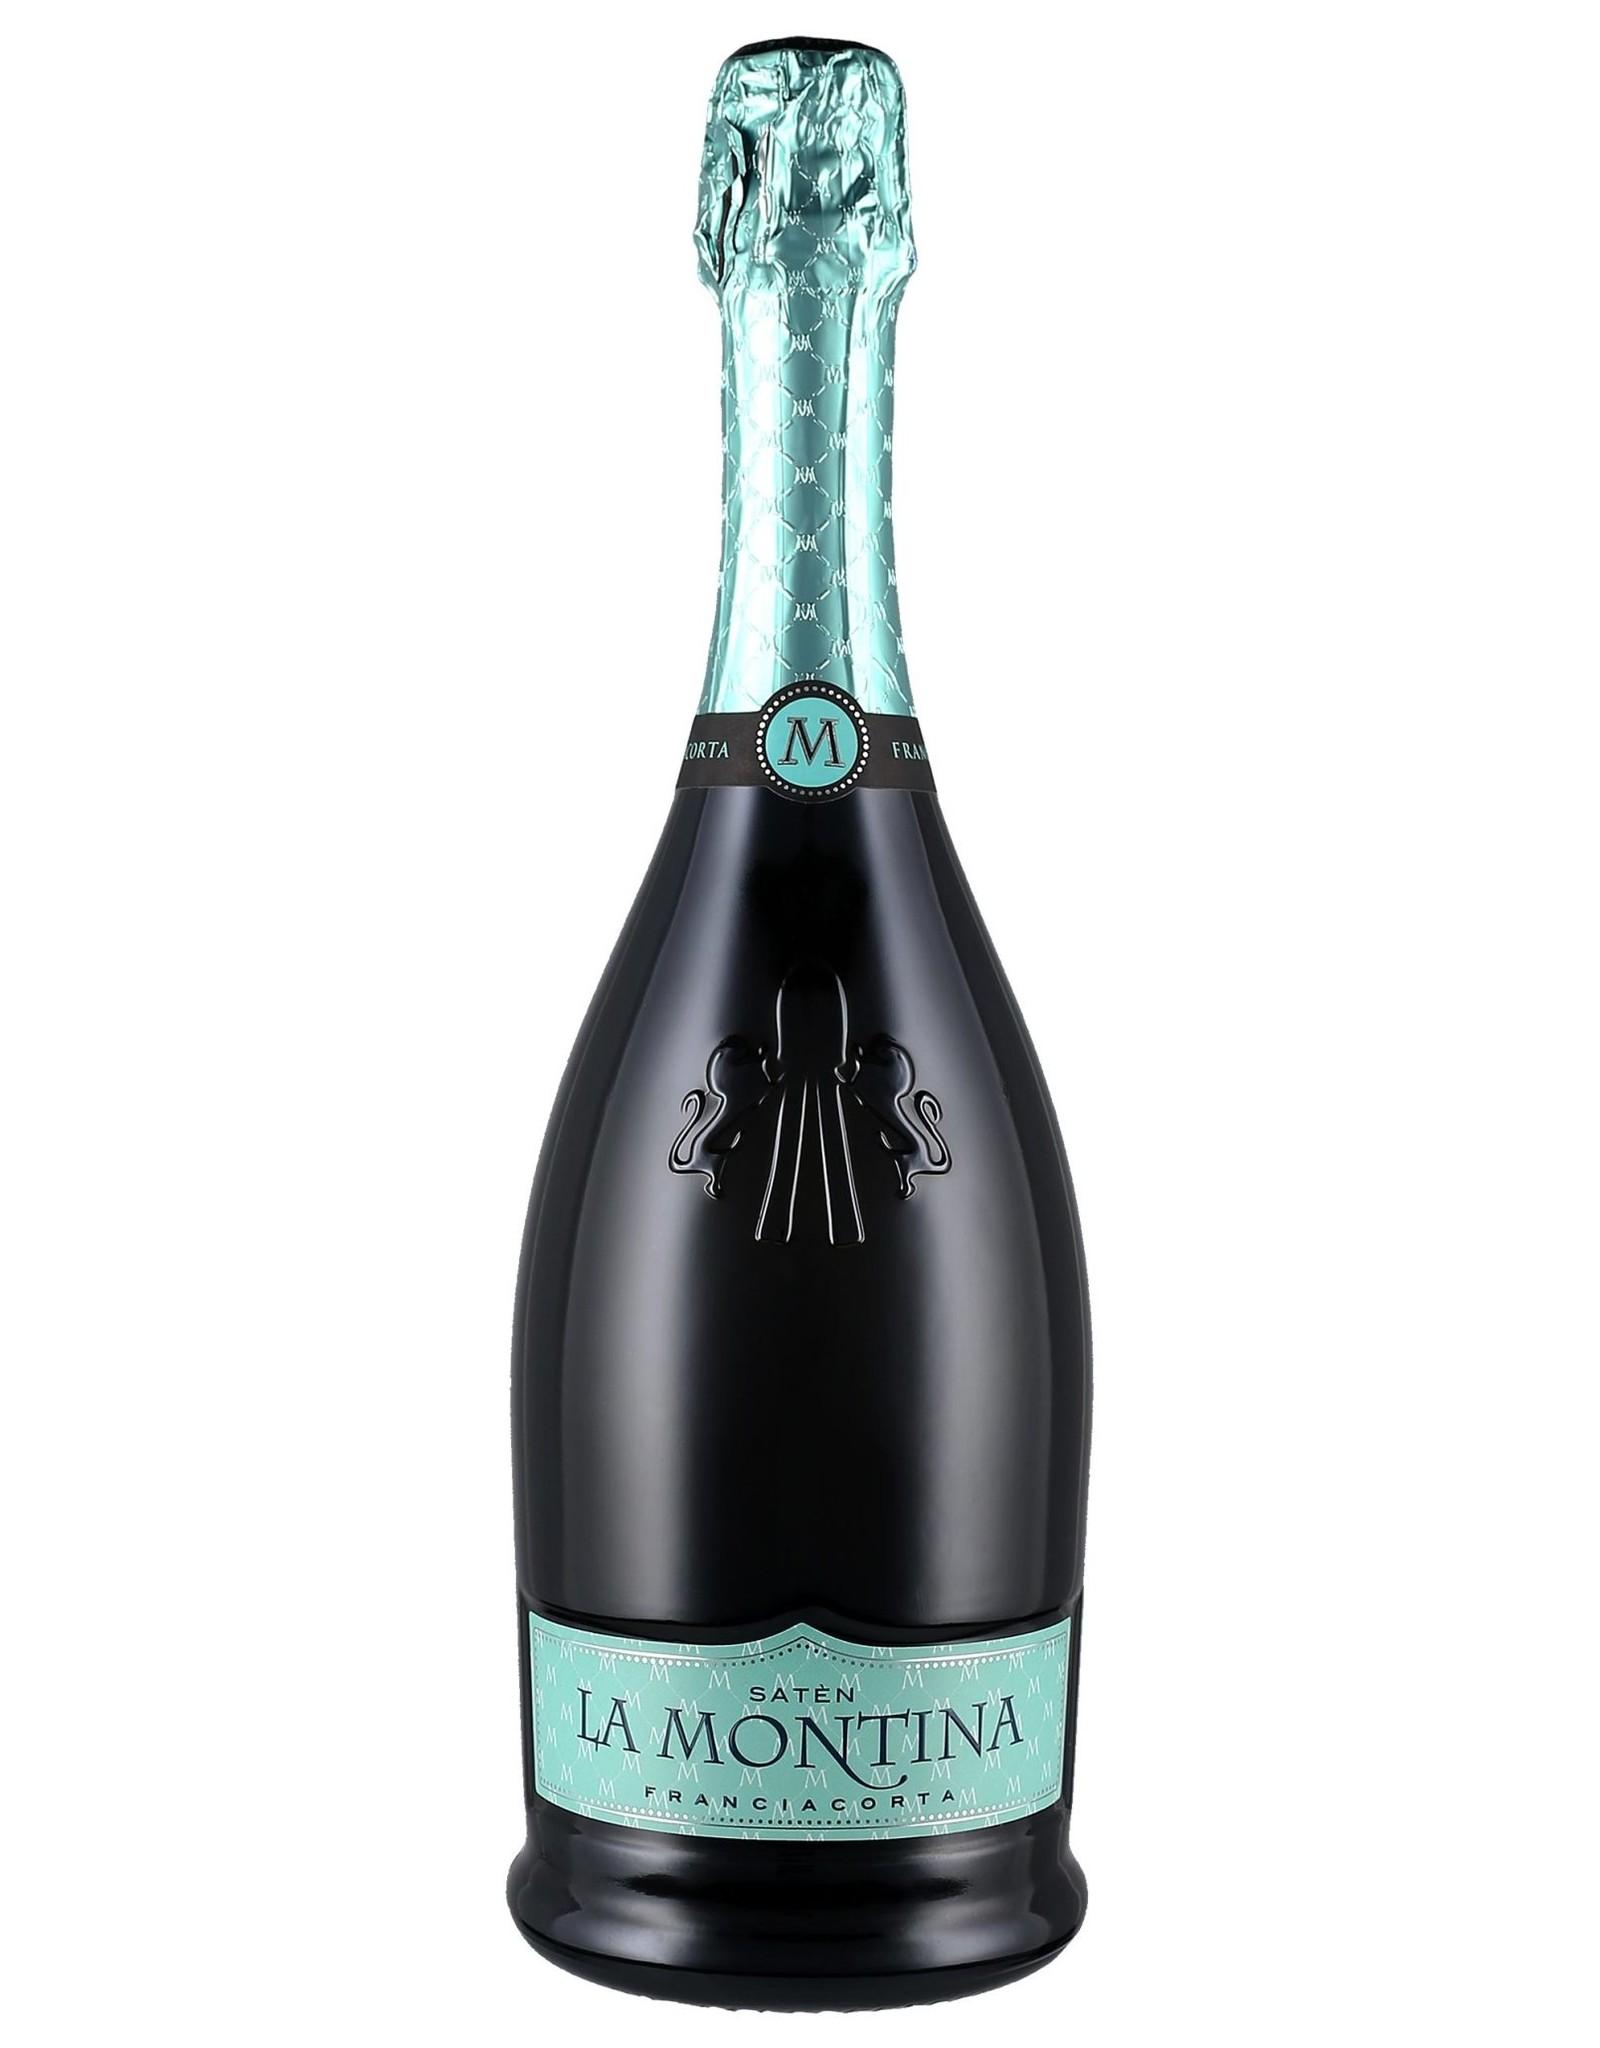 La Montina La Montina Franciacorta Saten, Lombardy NV